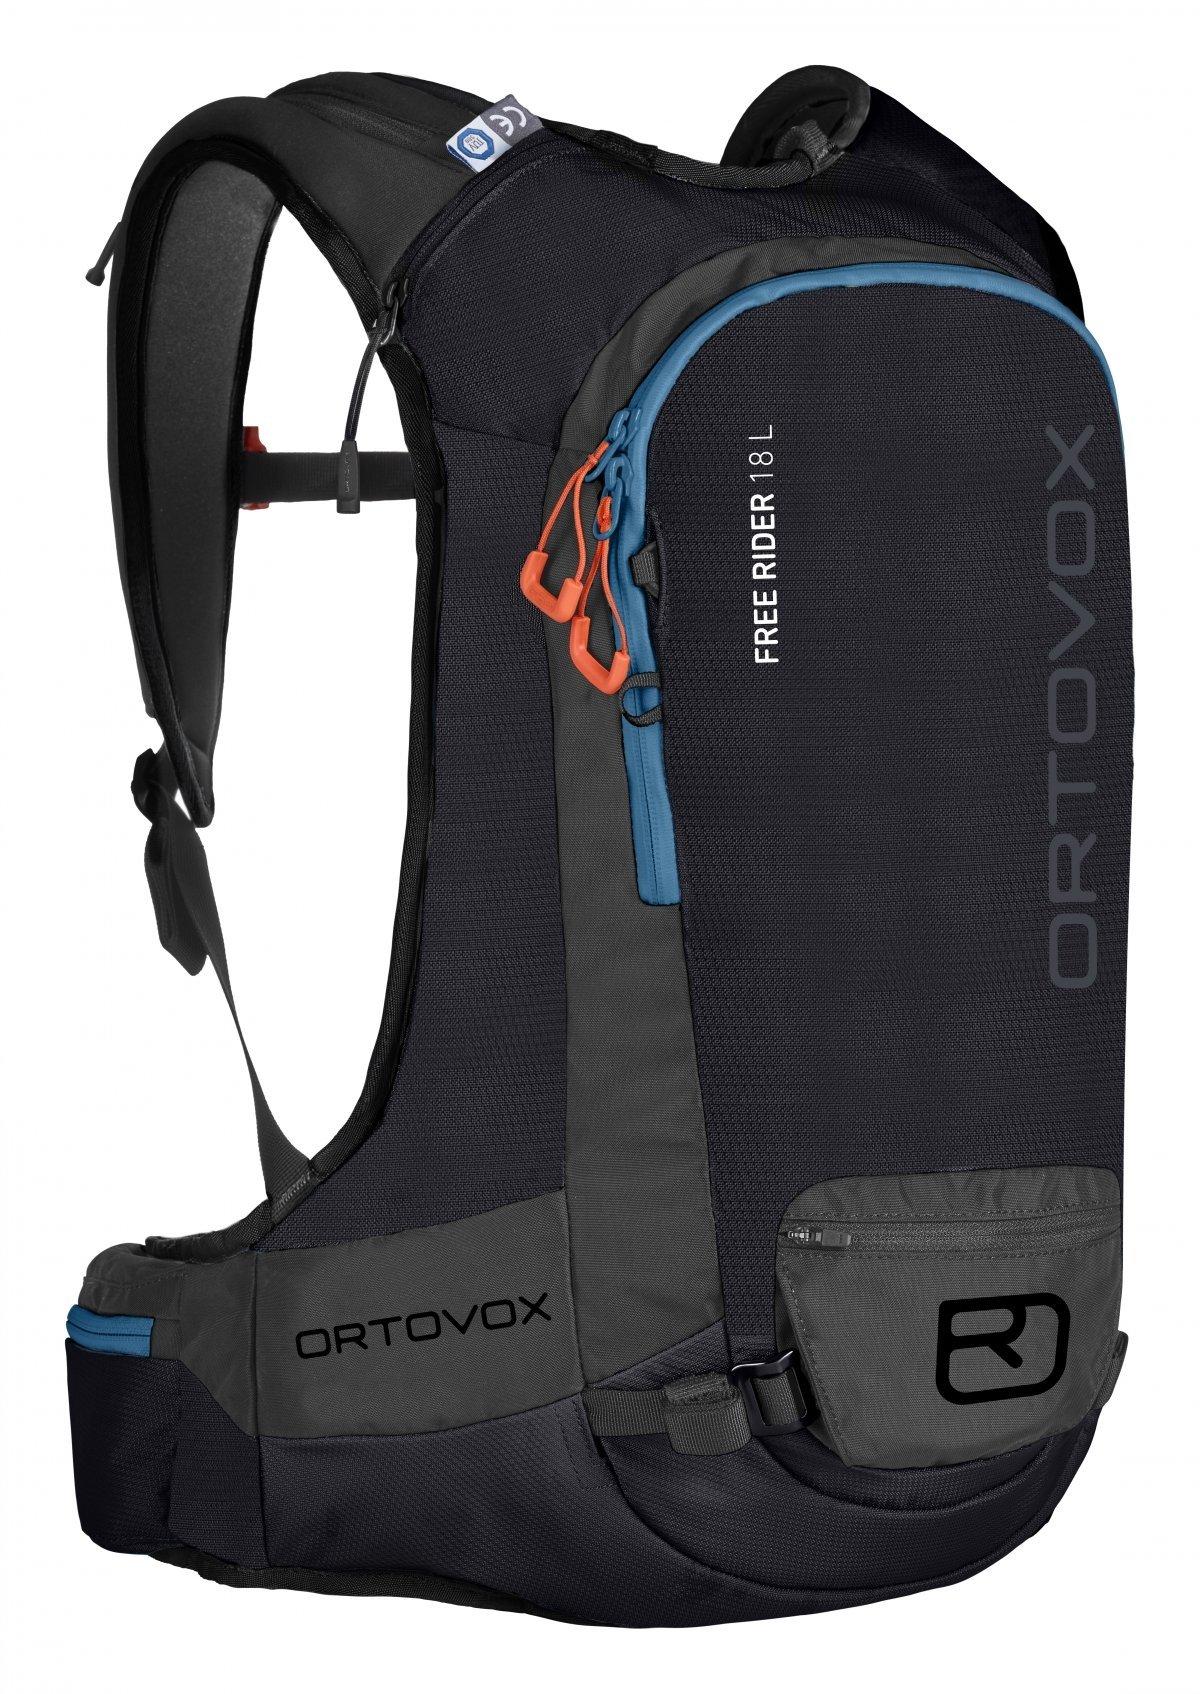 2018 ORTOVOX FREE RIDER 18 BLACK RAVEN